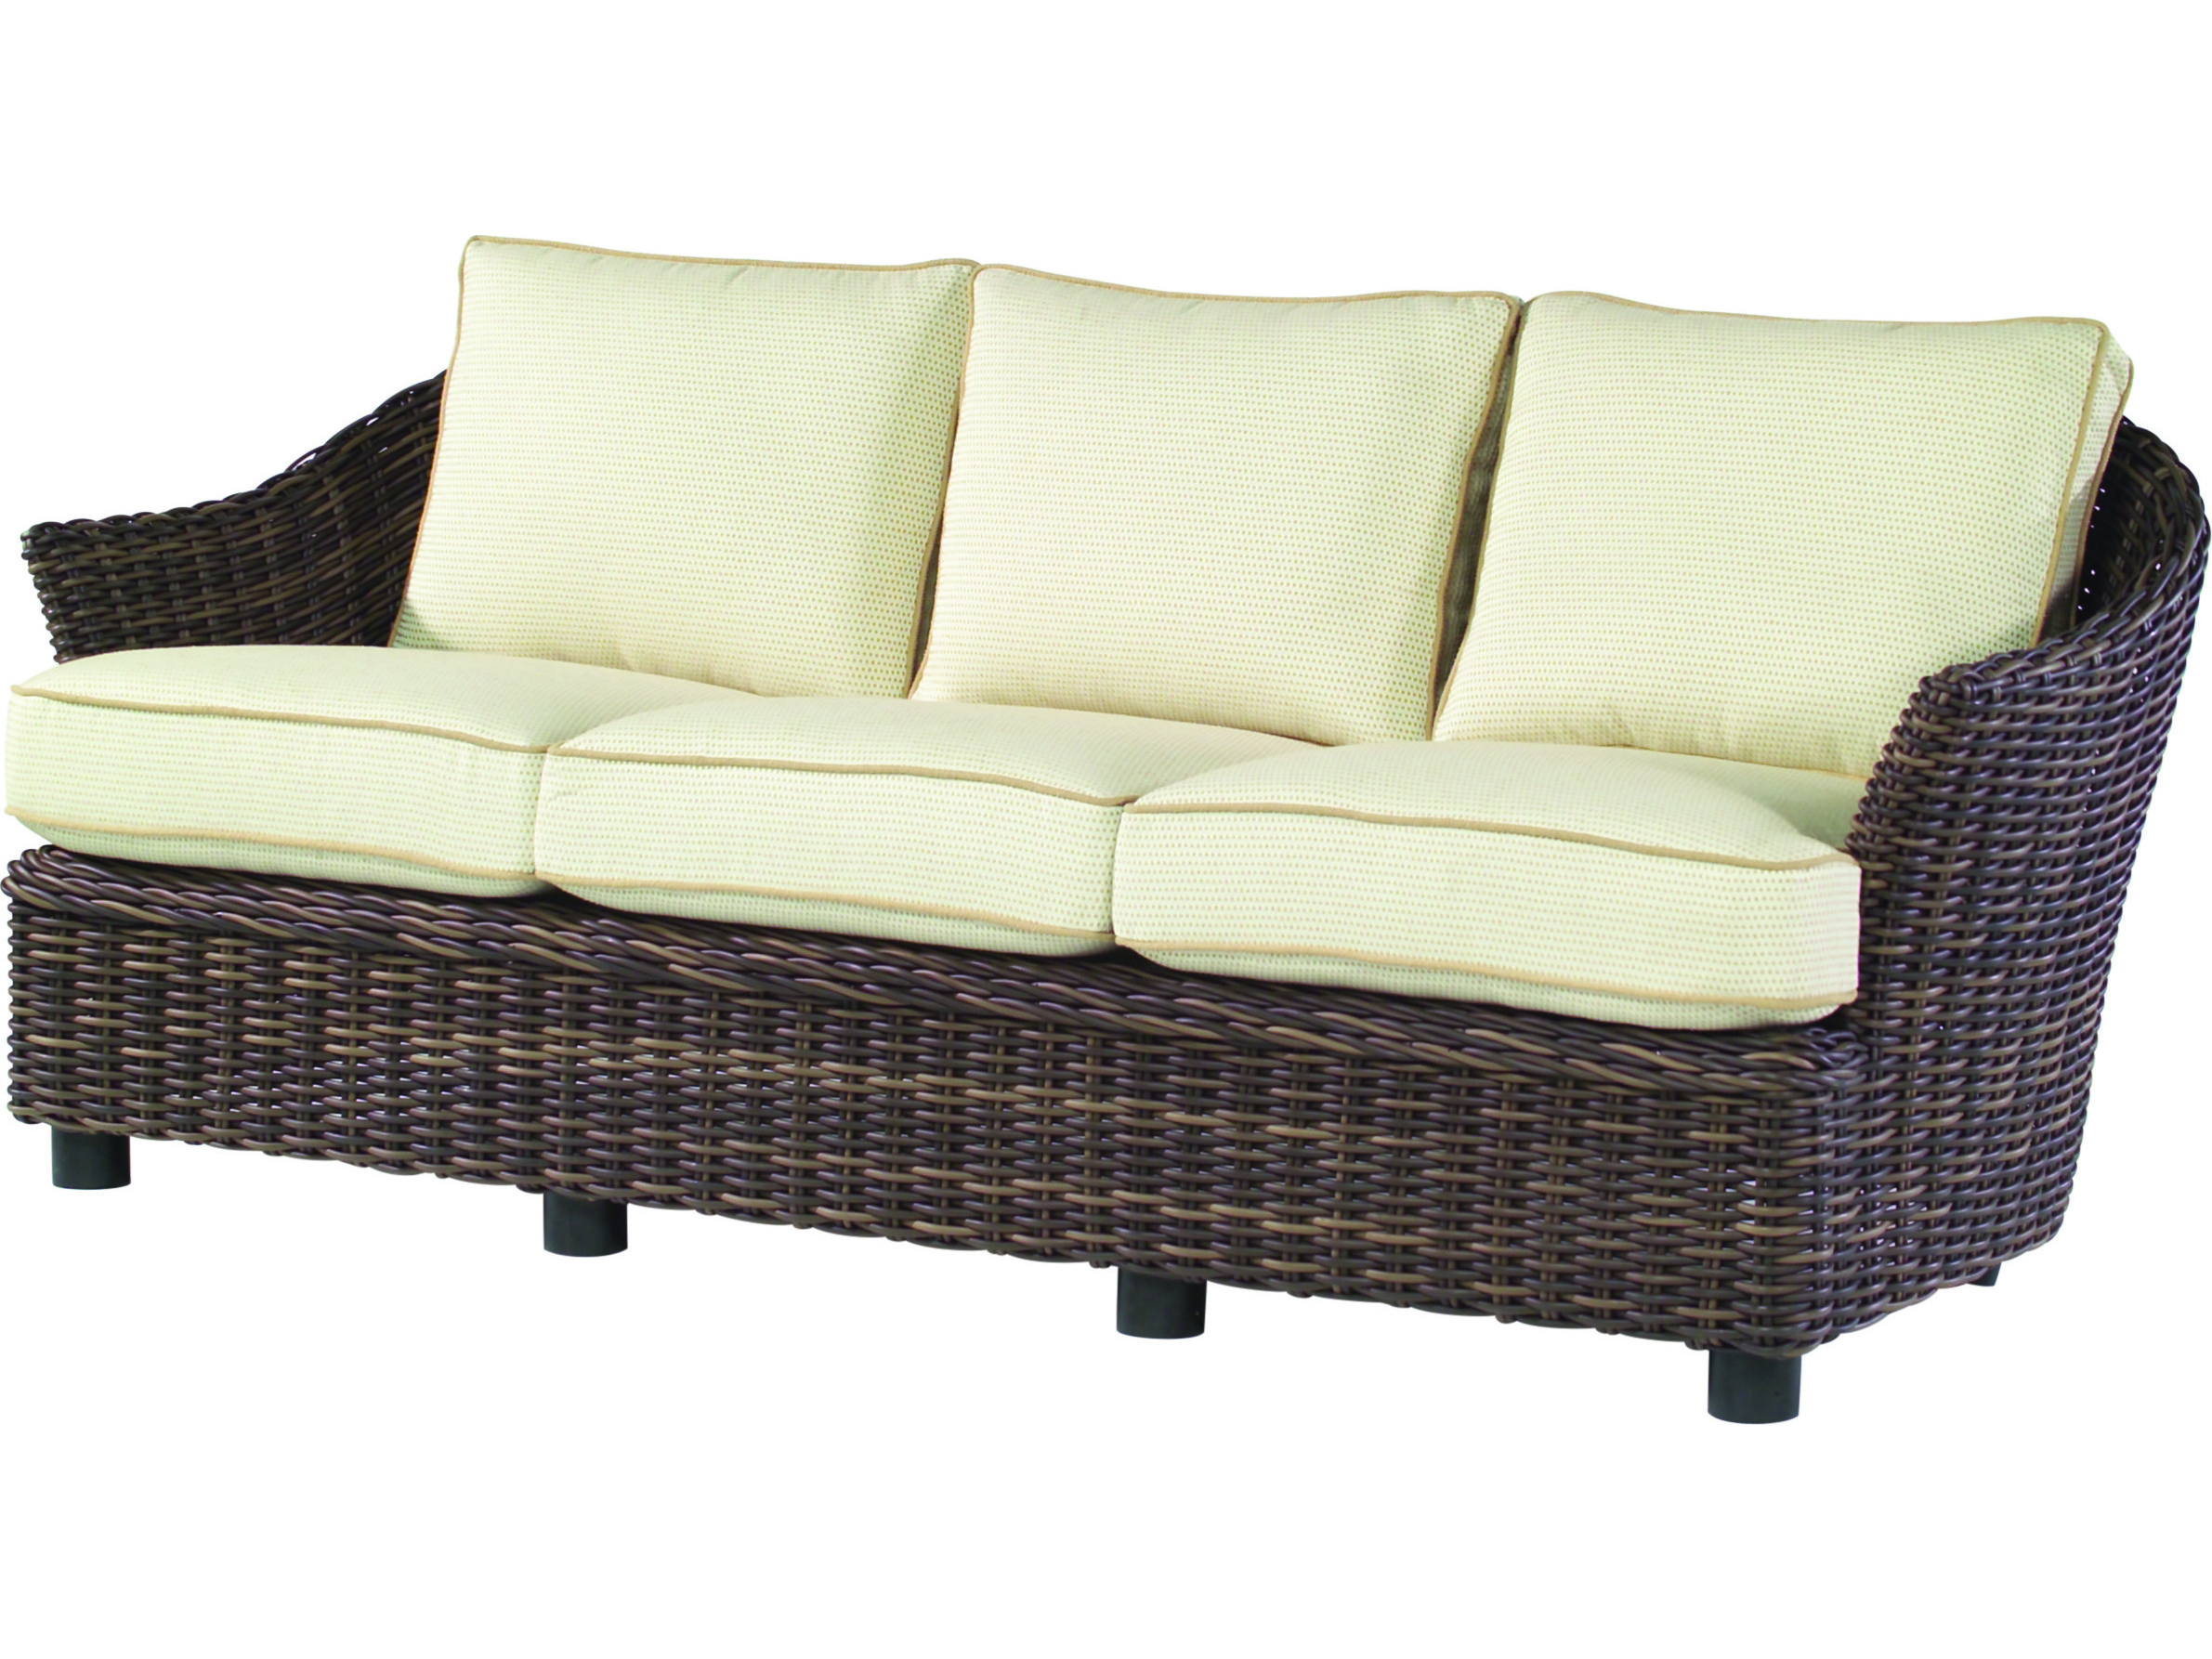 Wicker Sofa Cushion St Thomas Outdoor Wicker Sofa All About Thesofa